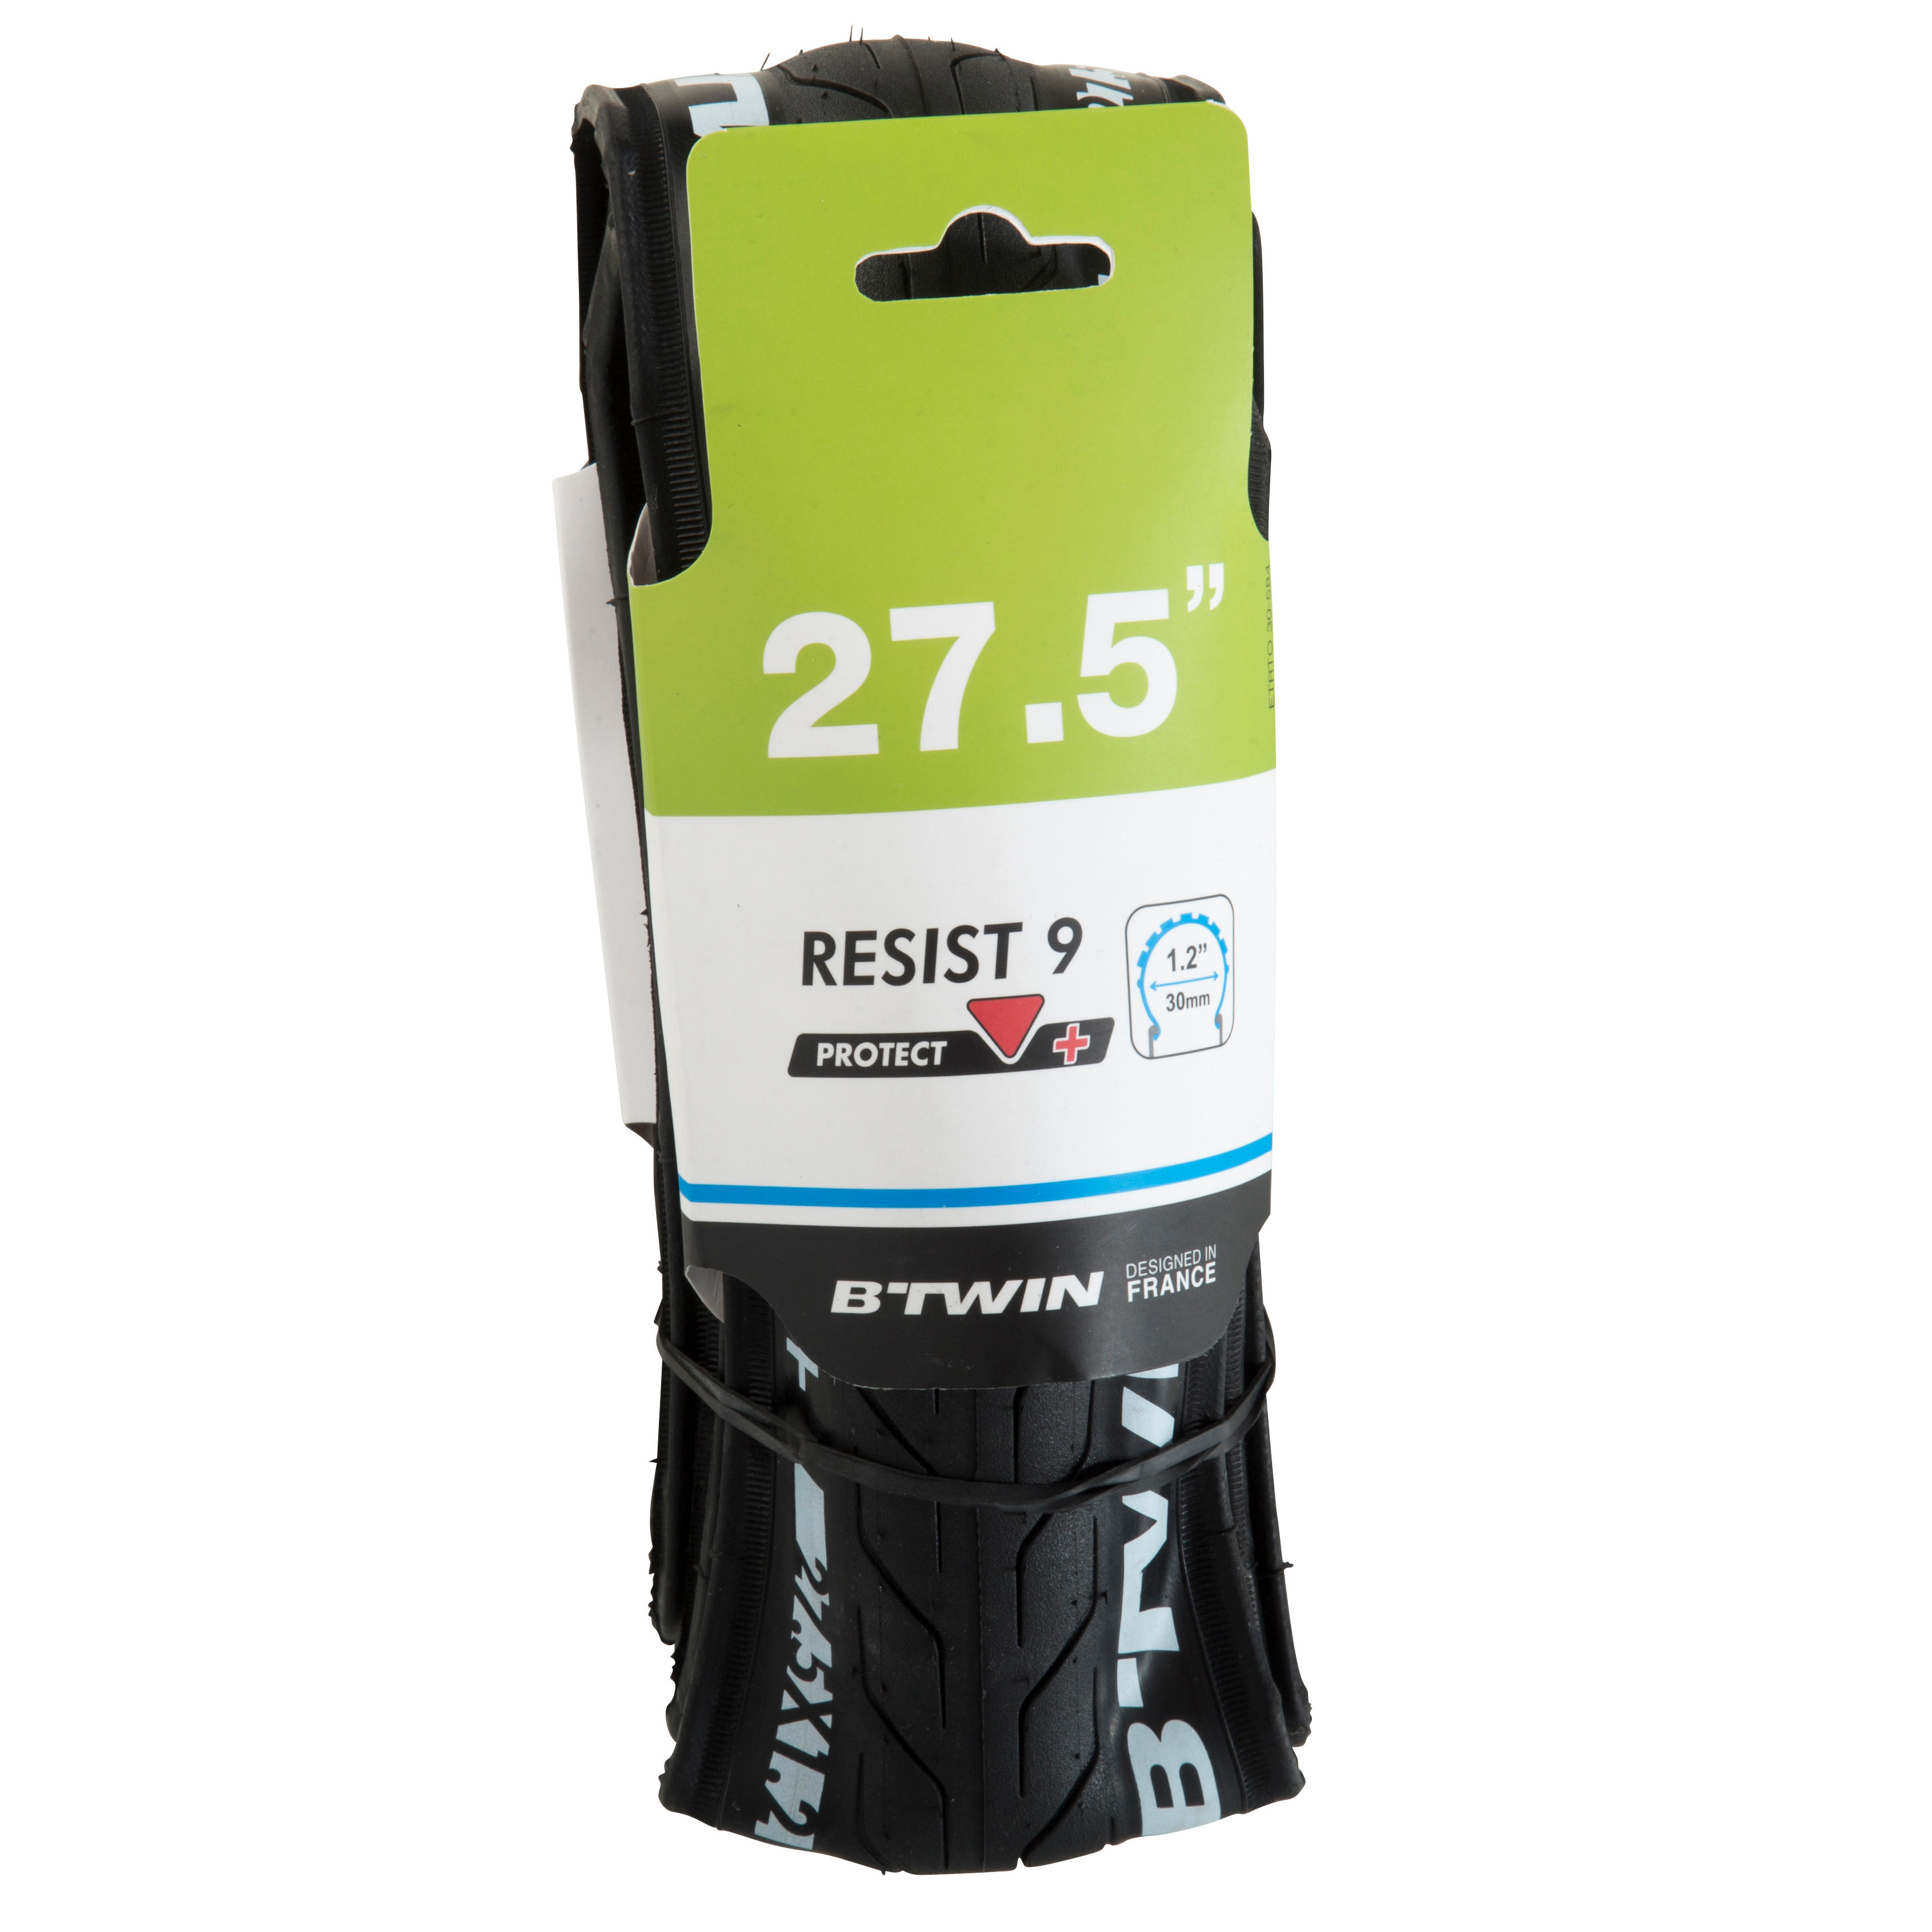 Resist 9 Slick 27.5x1.2 Flex Bead + Protection MTB Tyre / ETRTO 30-584